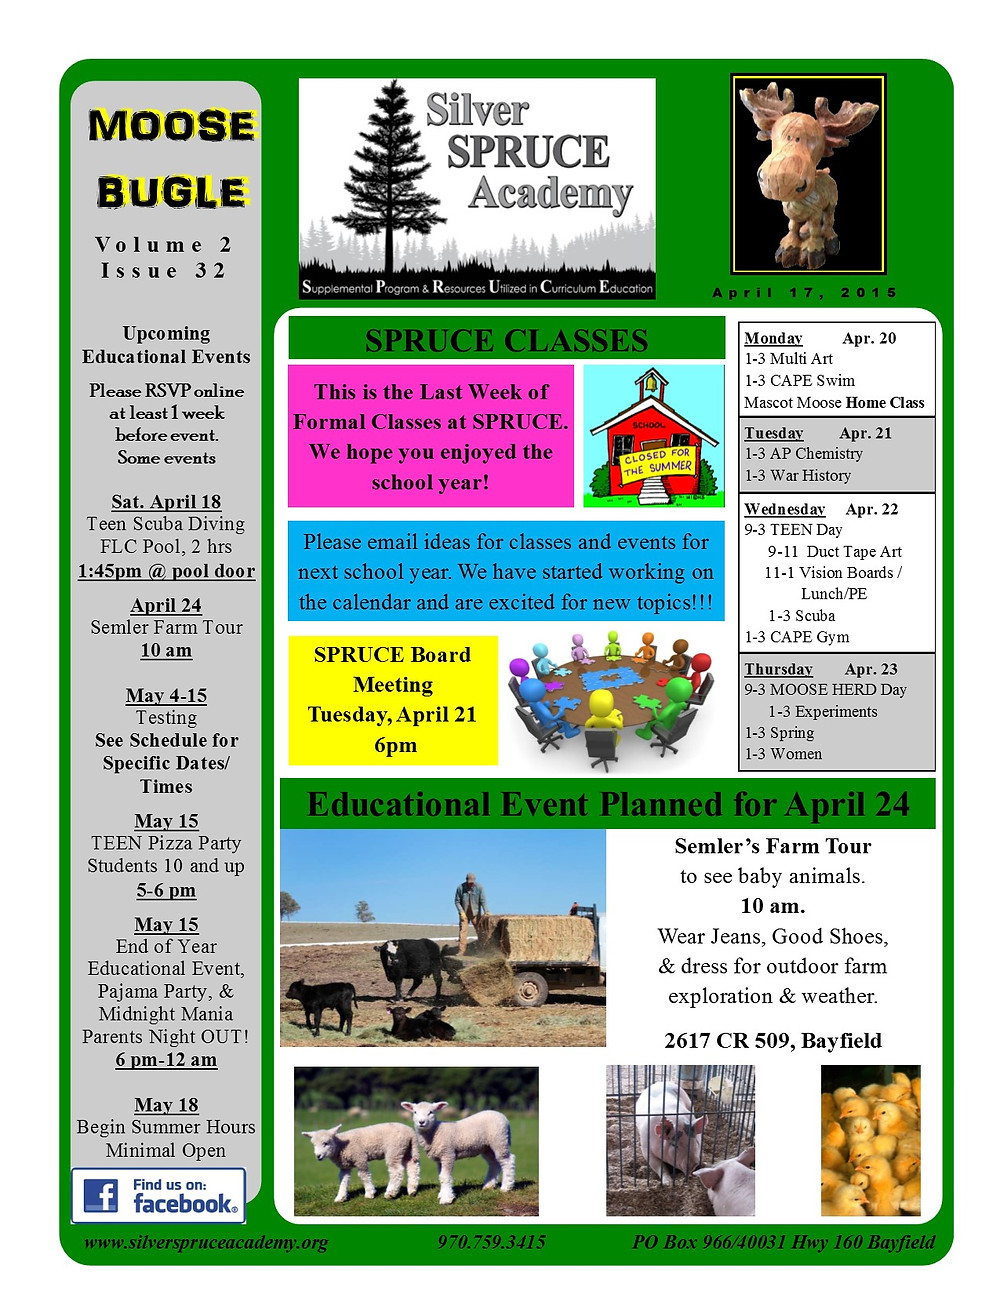 Moose Bugle 4-17-15 (Page 1).jpg